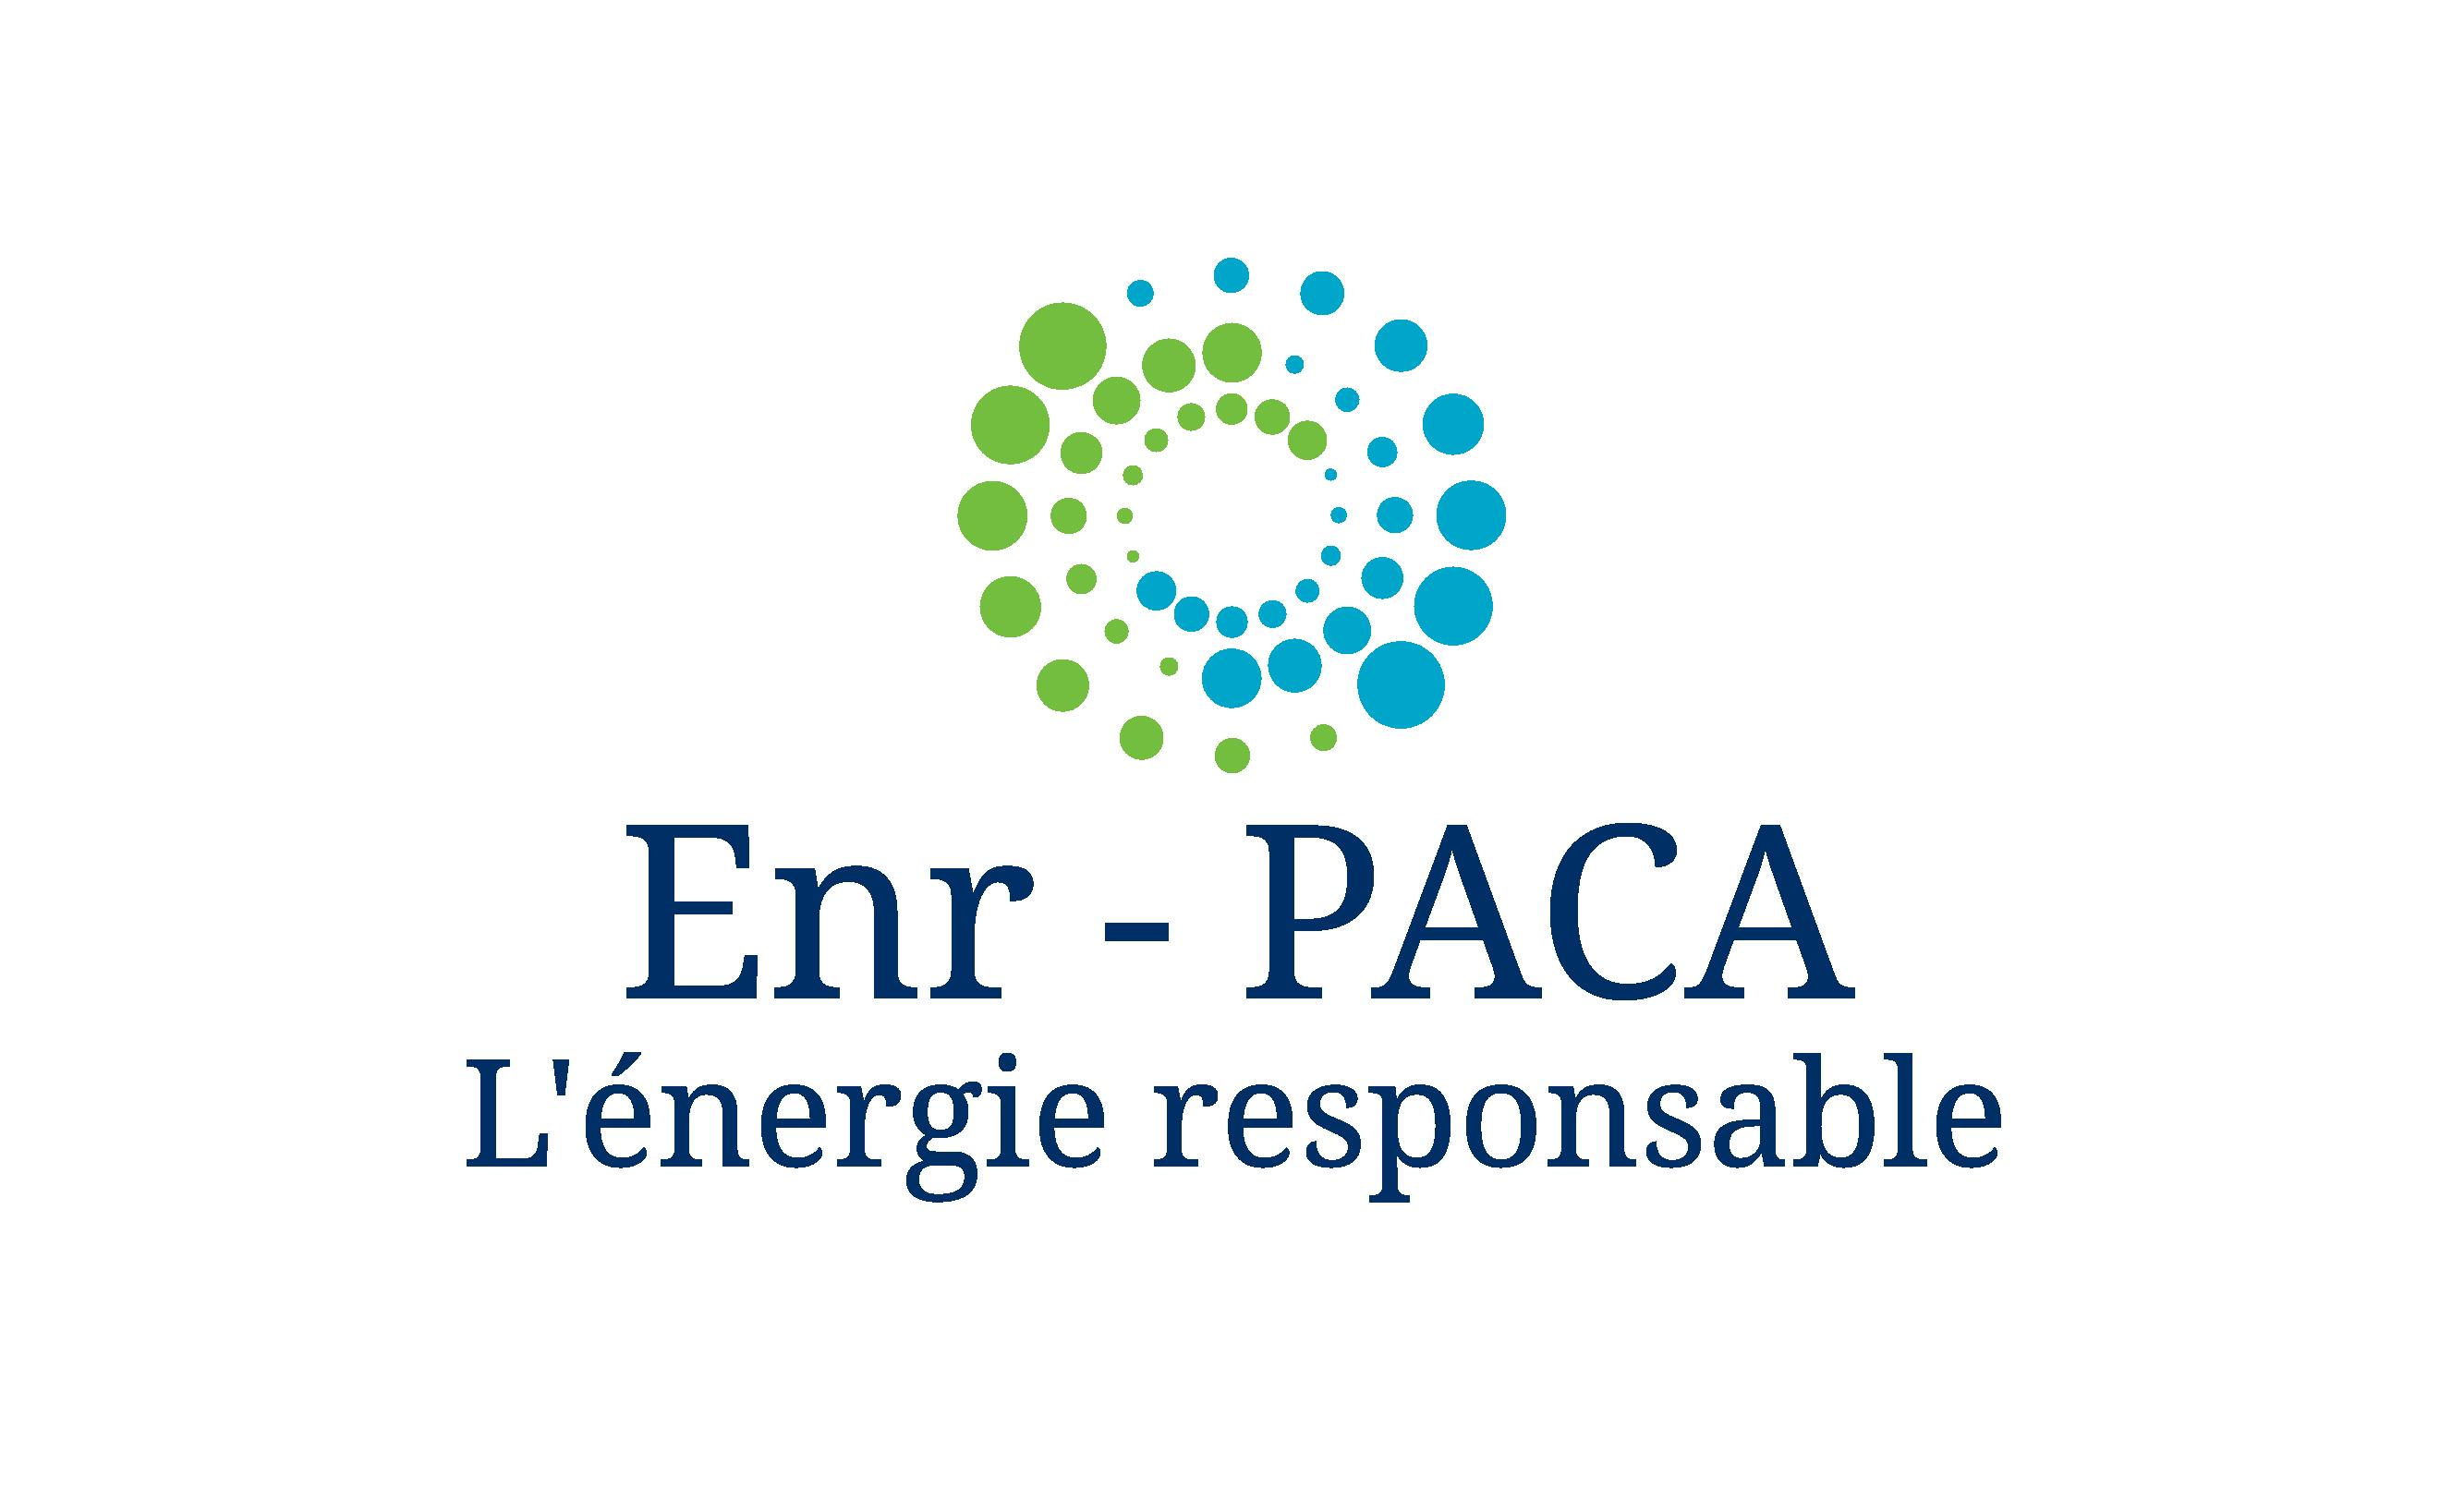 Enr-PACA